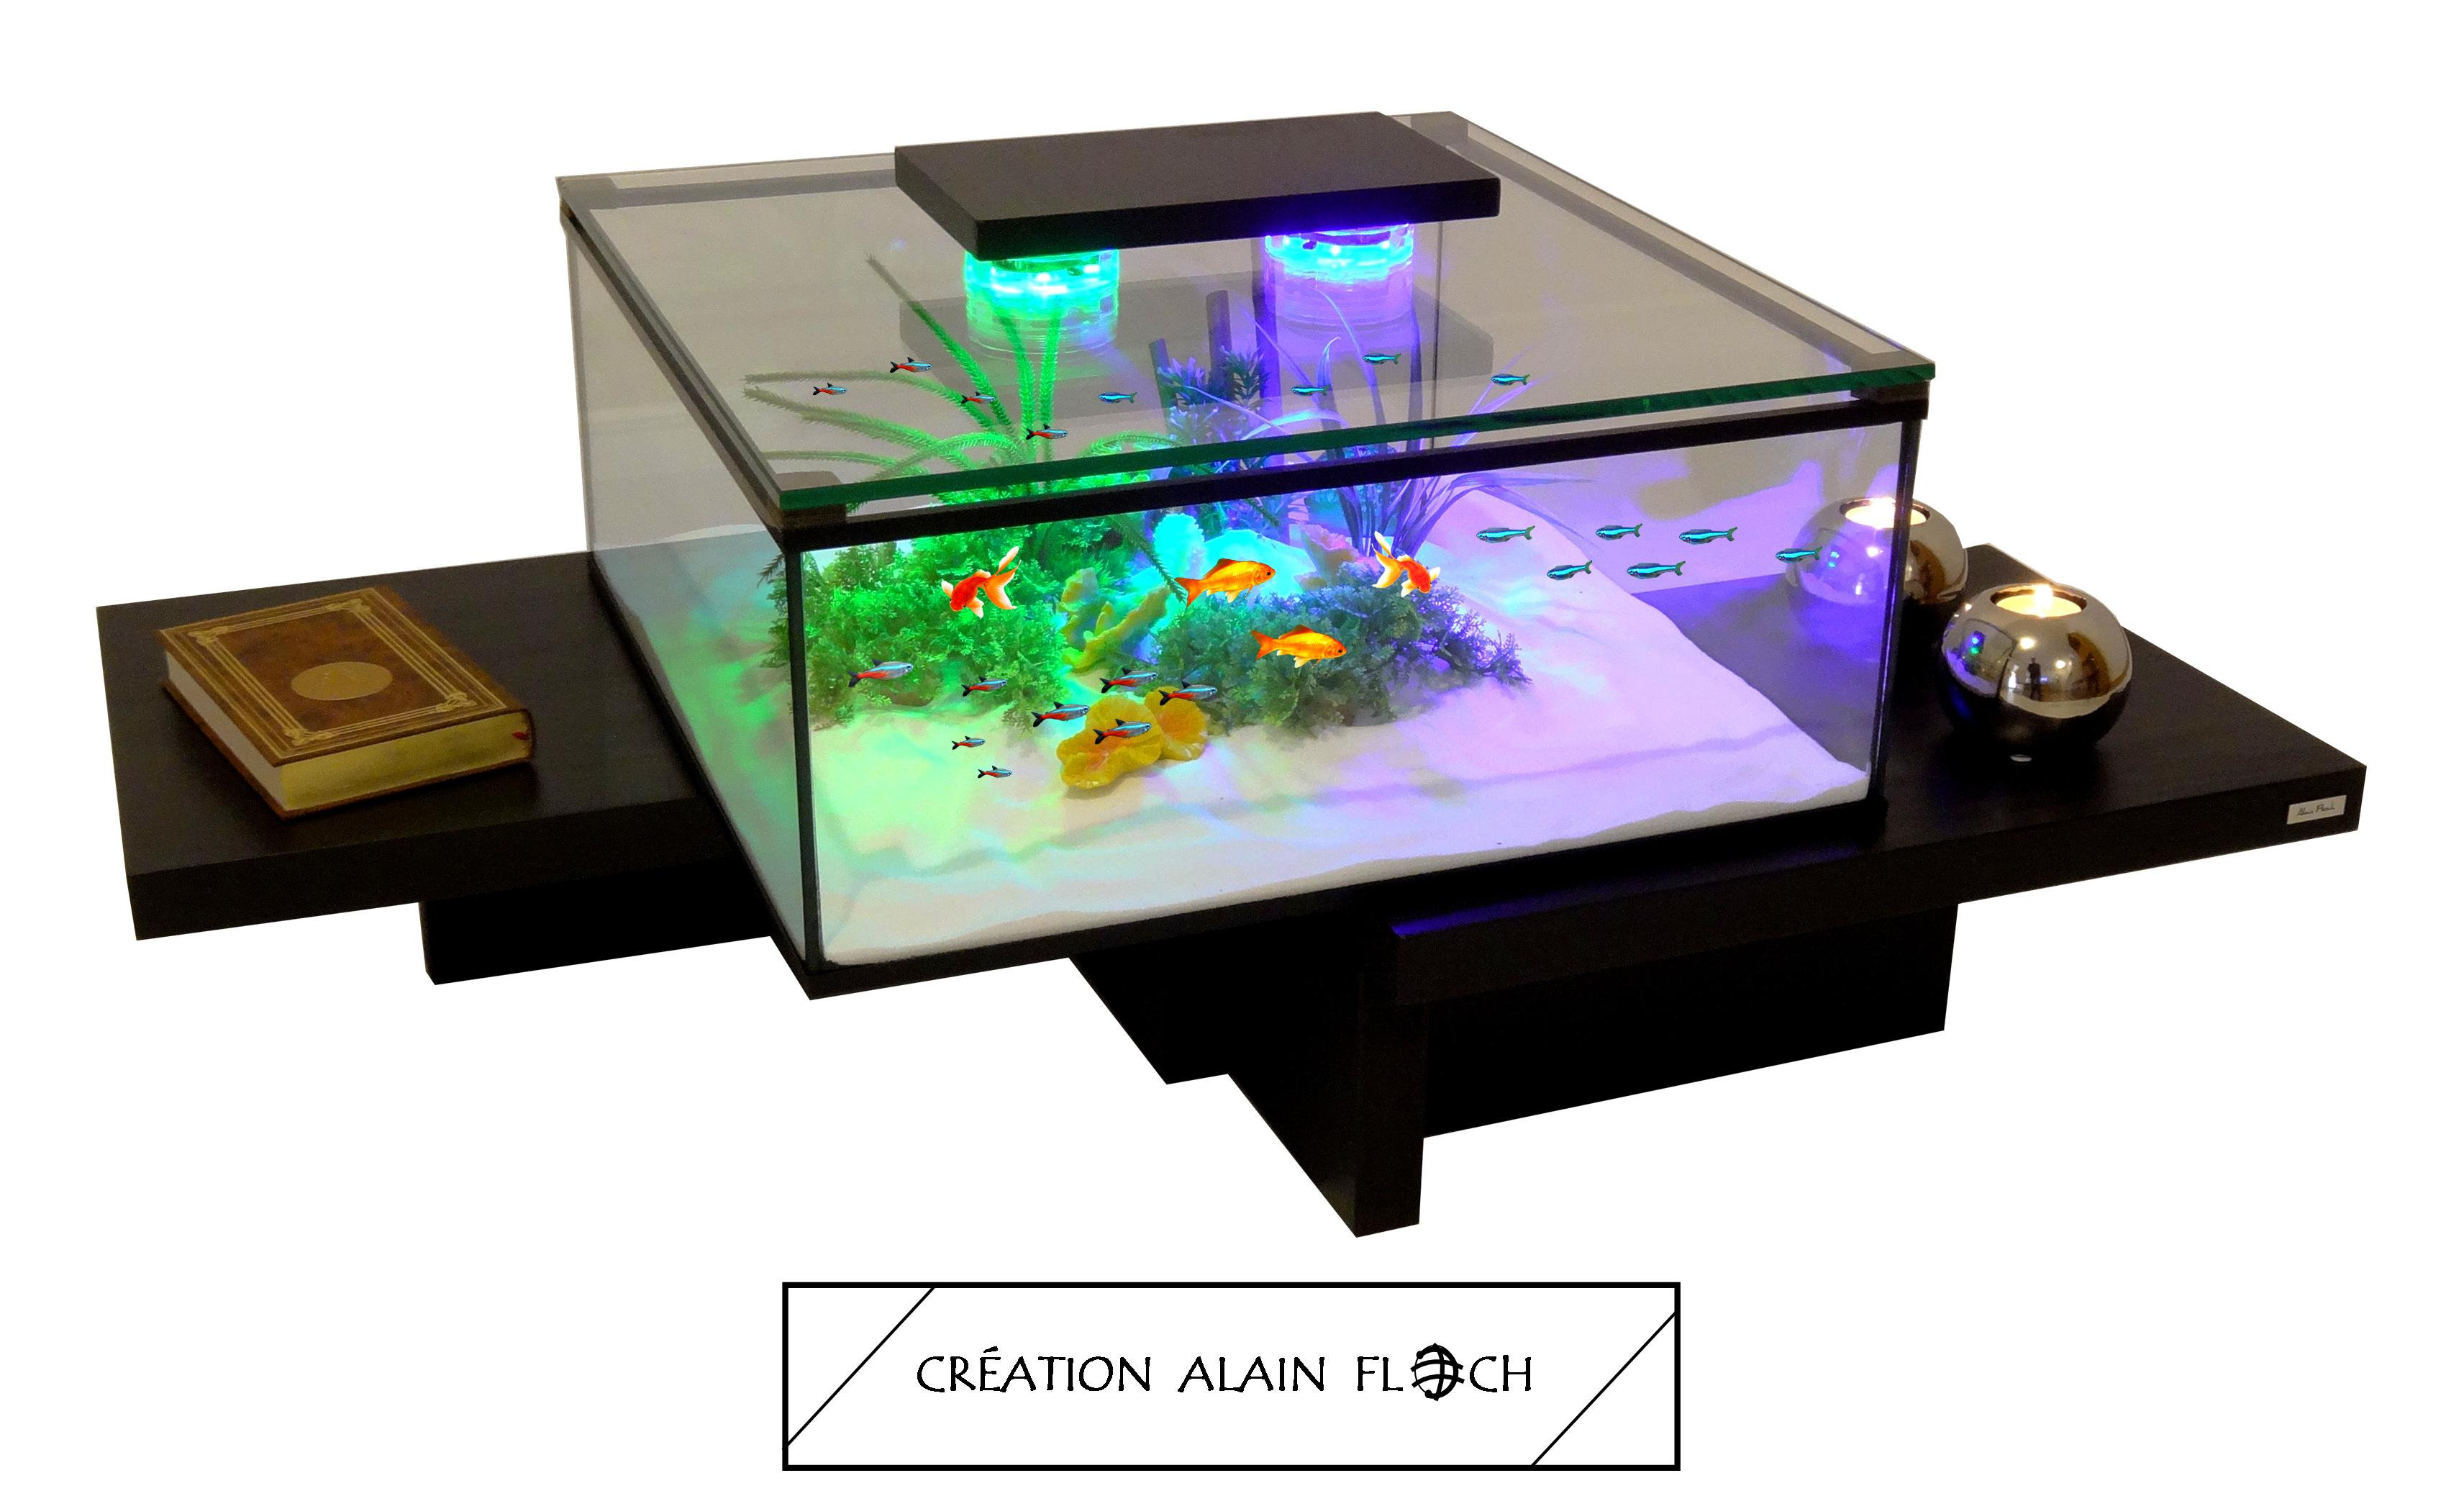 LED aquarium 20 EQUILIBRE Table basse 4AL3R5j